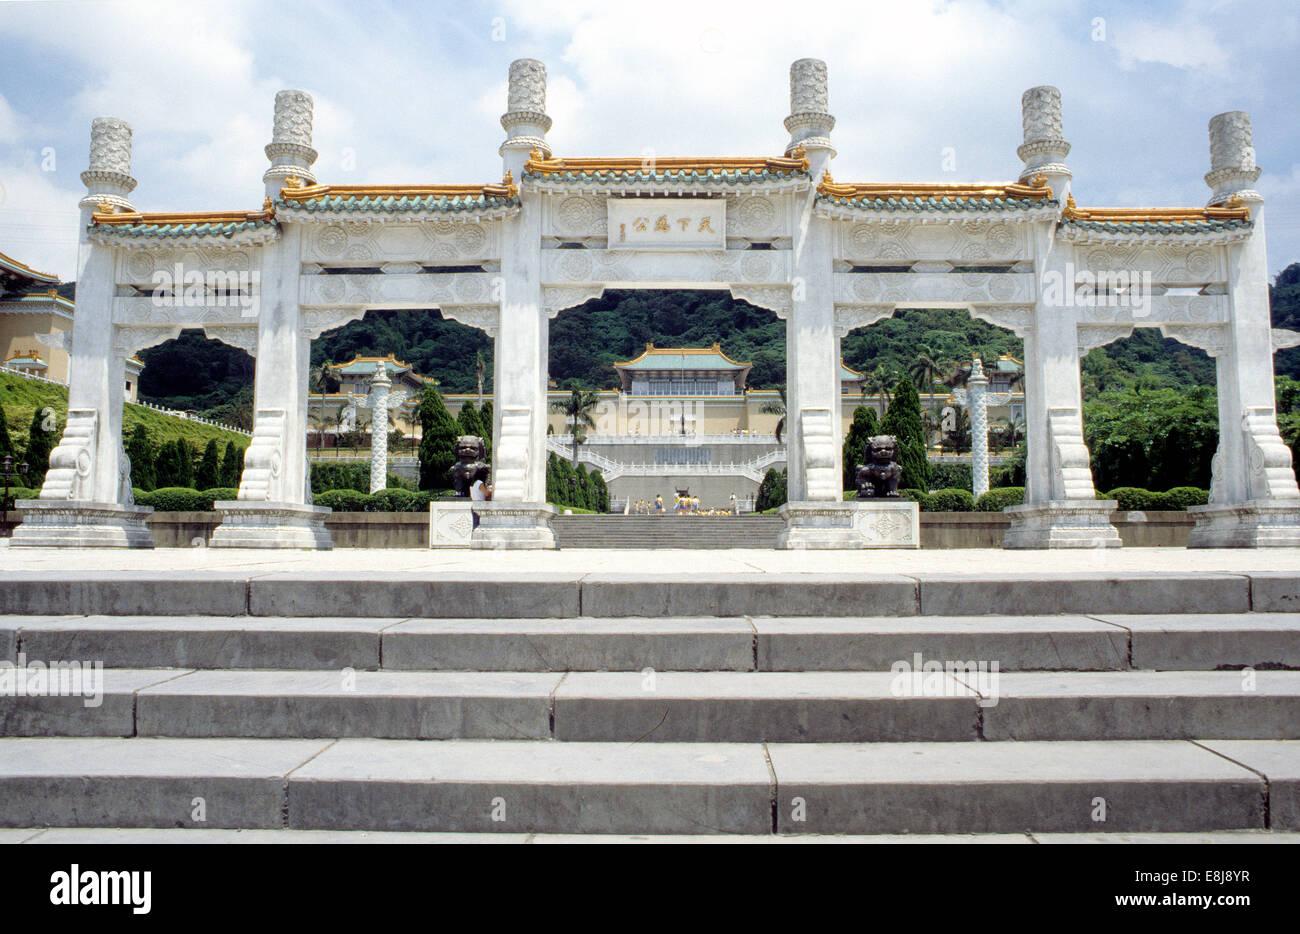 National Palace Museum. National Palace. 1624-1662 - Stock Image